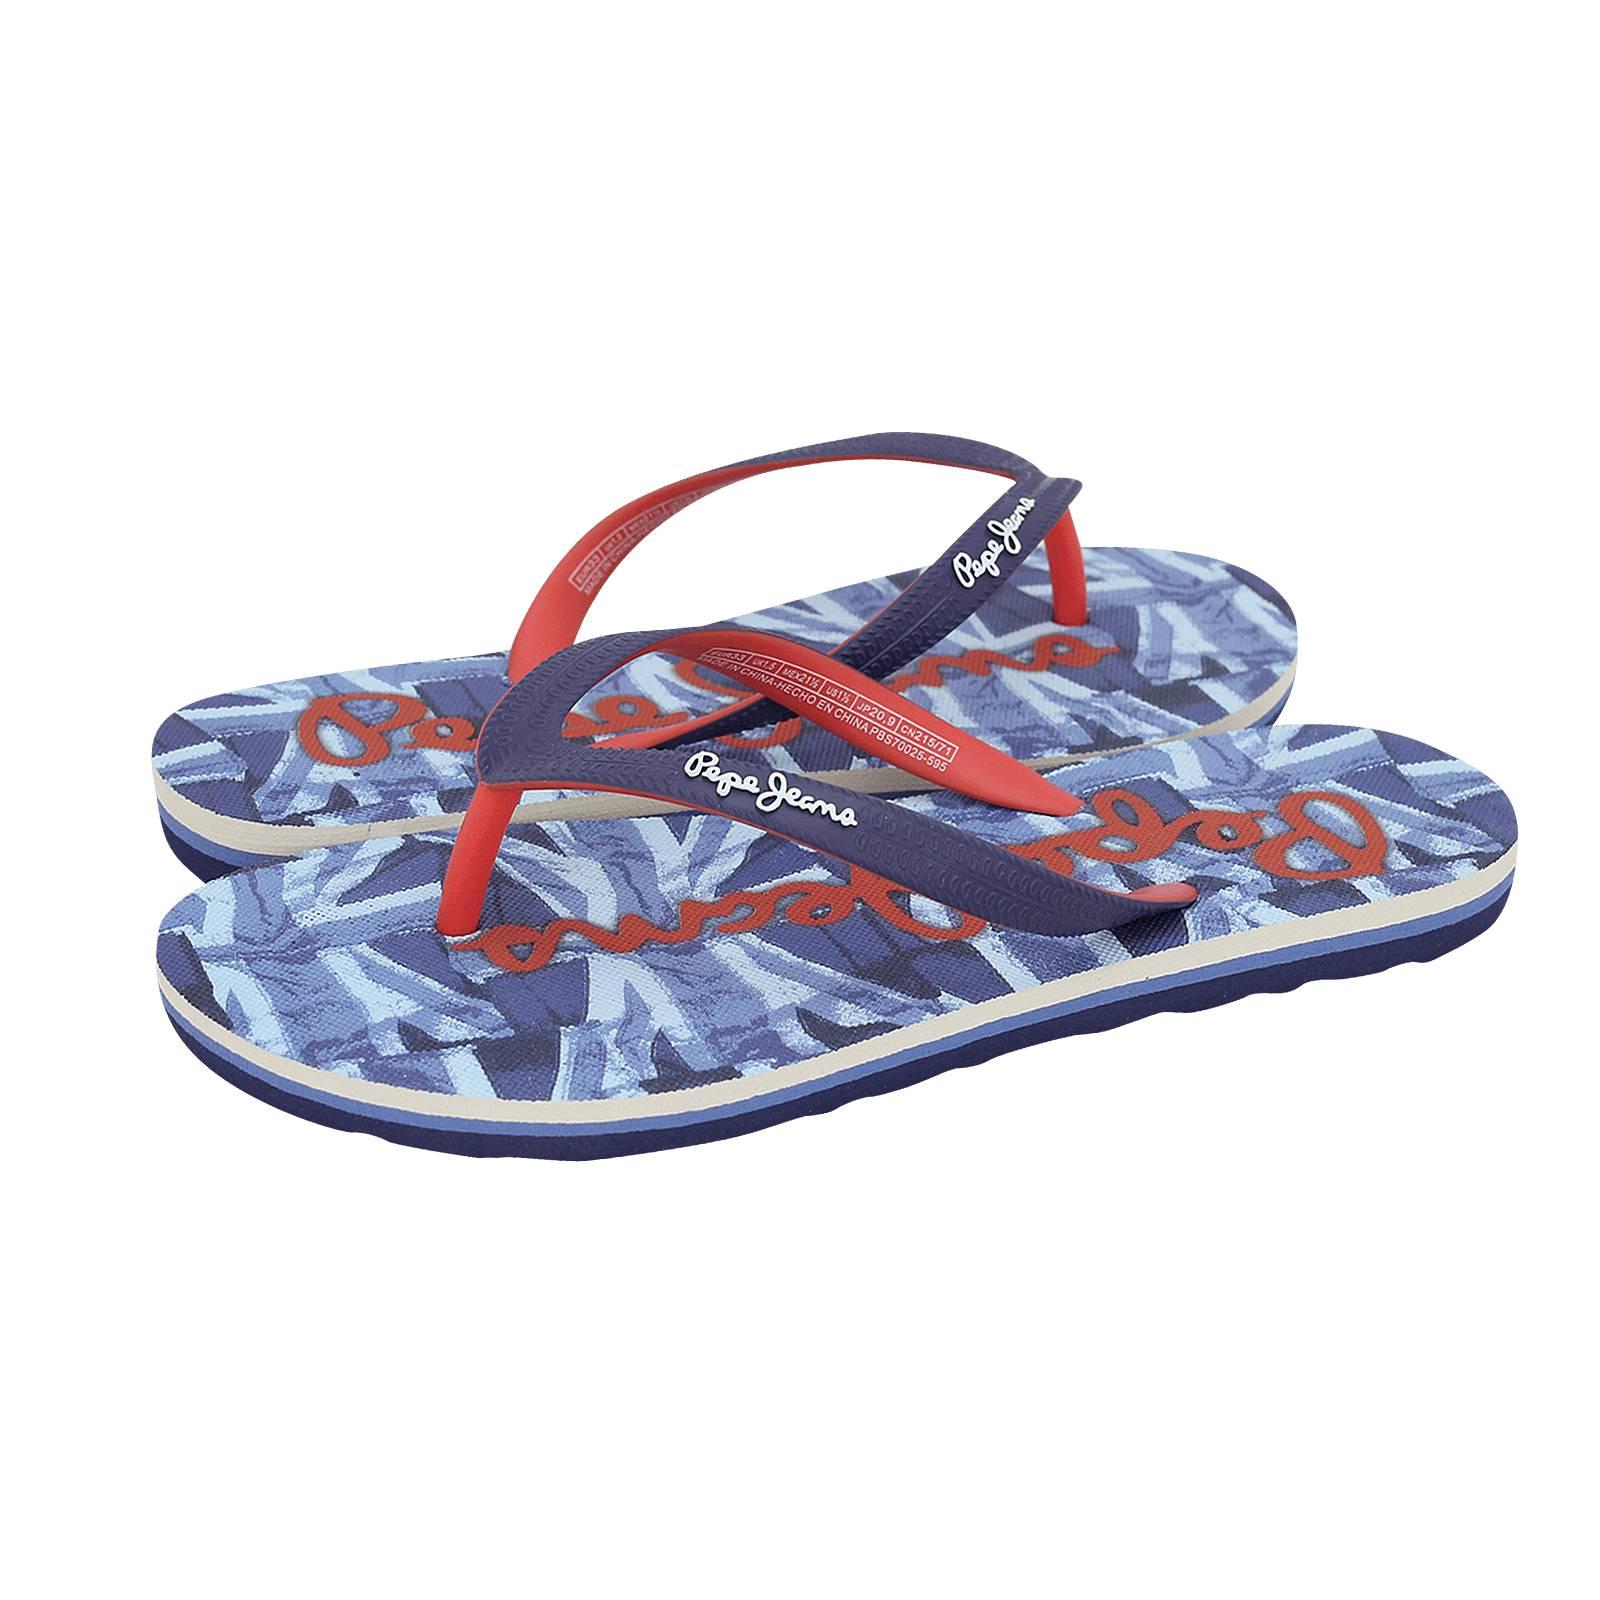 517969e49c0 Beach Uk Boy - Παιδικά πέδιλα Pepe Jeans από συνθετικο - Gianna ...